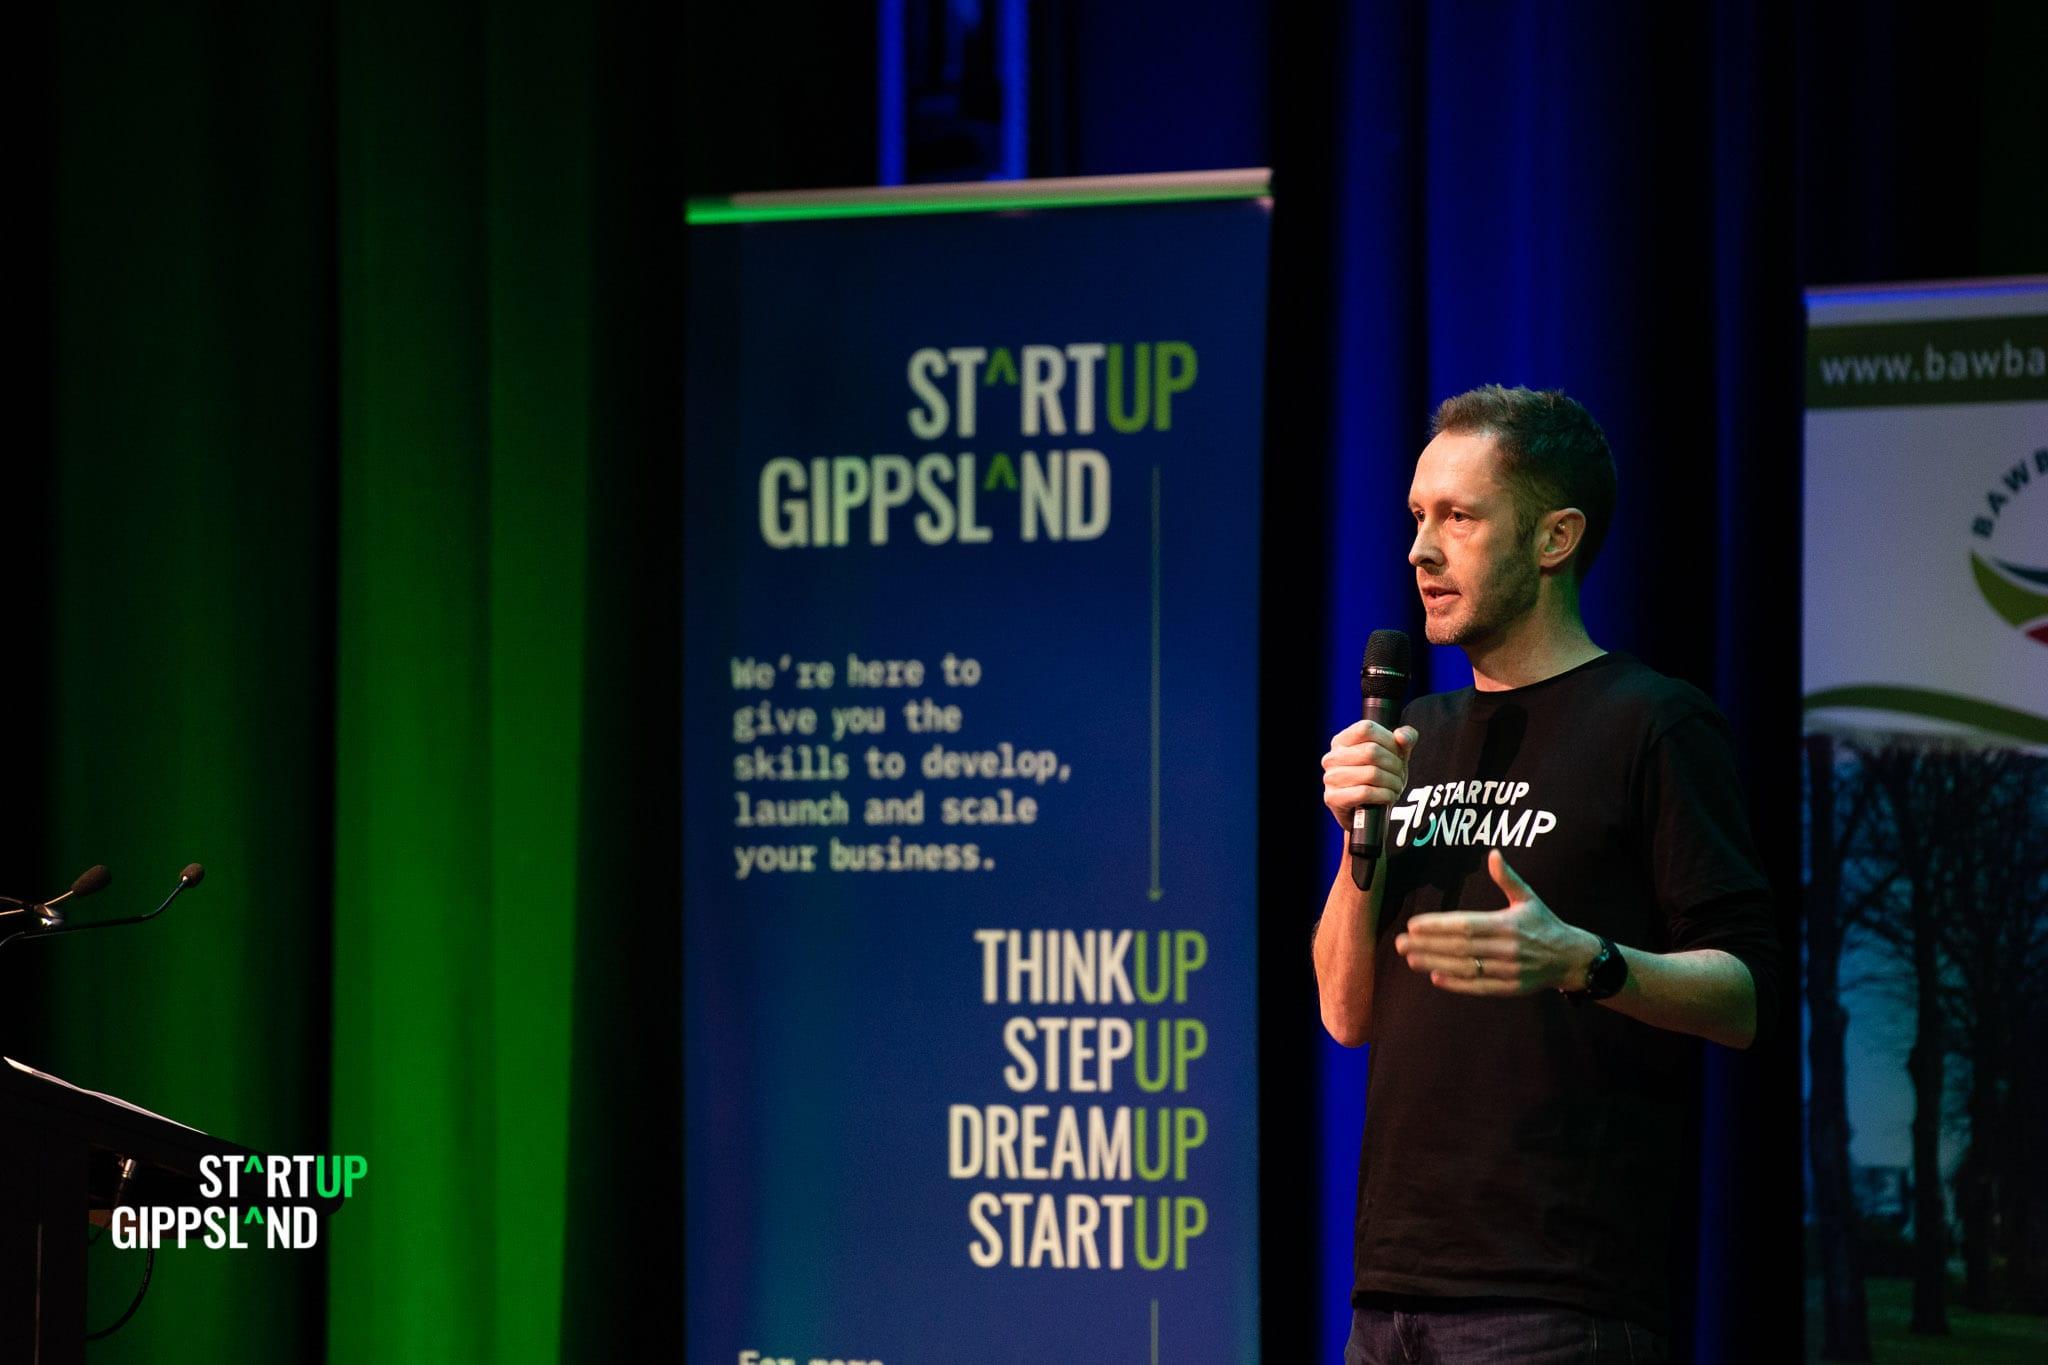 Startup Gippsland Photo Gallery Showcase Judge Collin Kinner Startup Onramp Brisbane